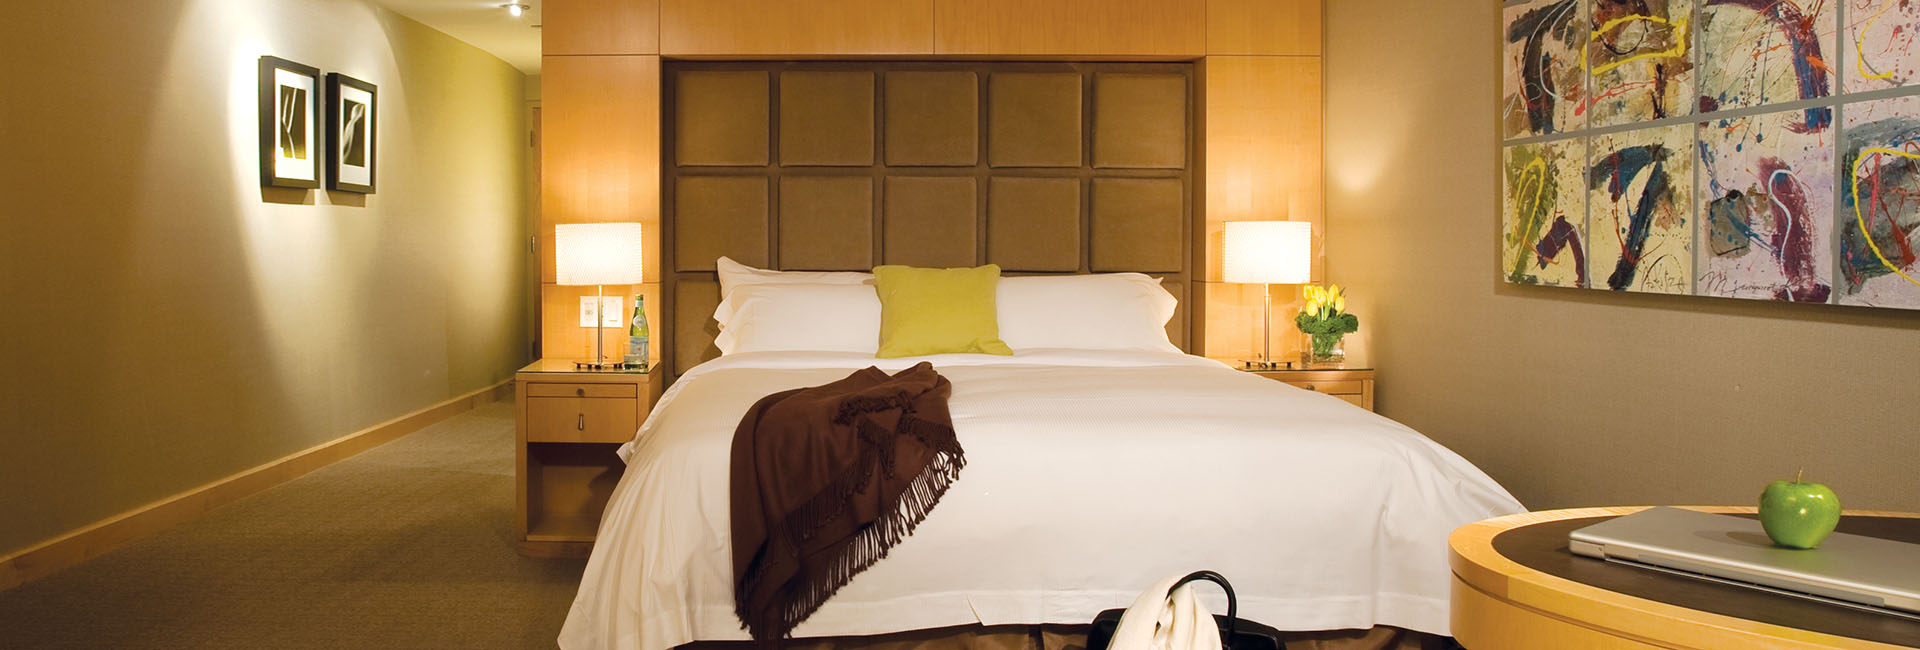 SoHo Metropolitan Hotel Toronto Luxury Hotel Toronto Boutique